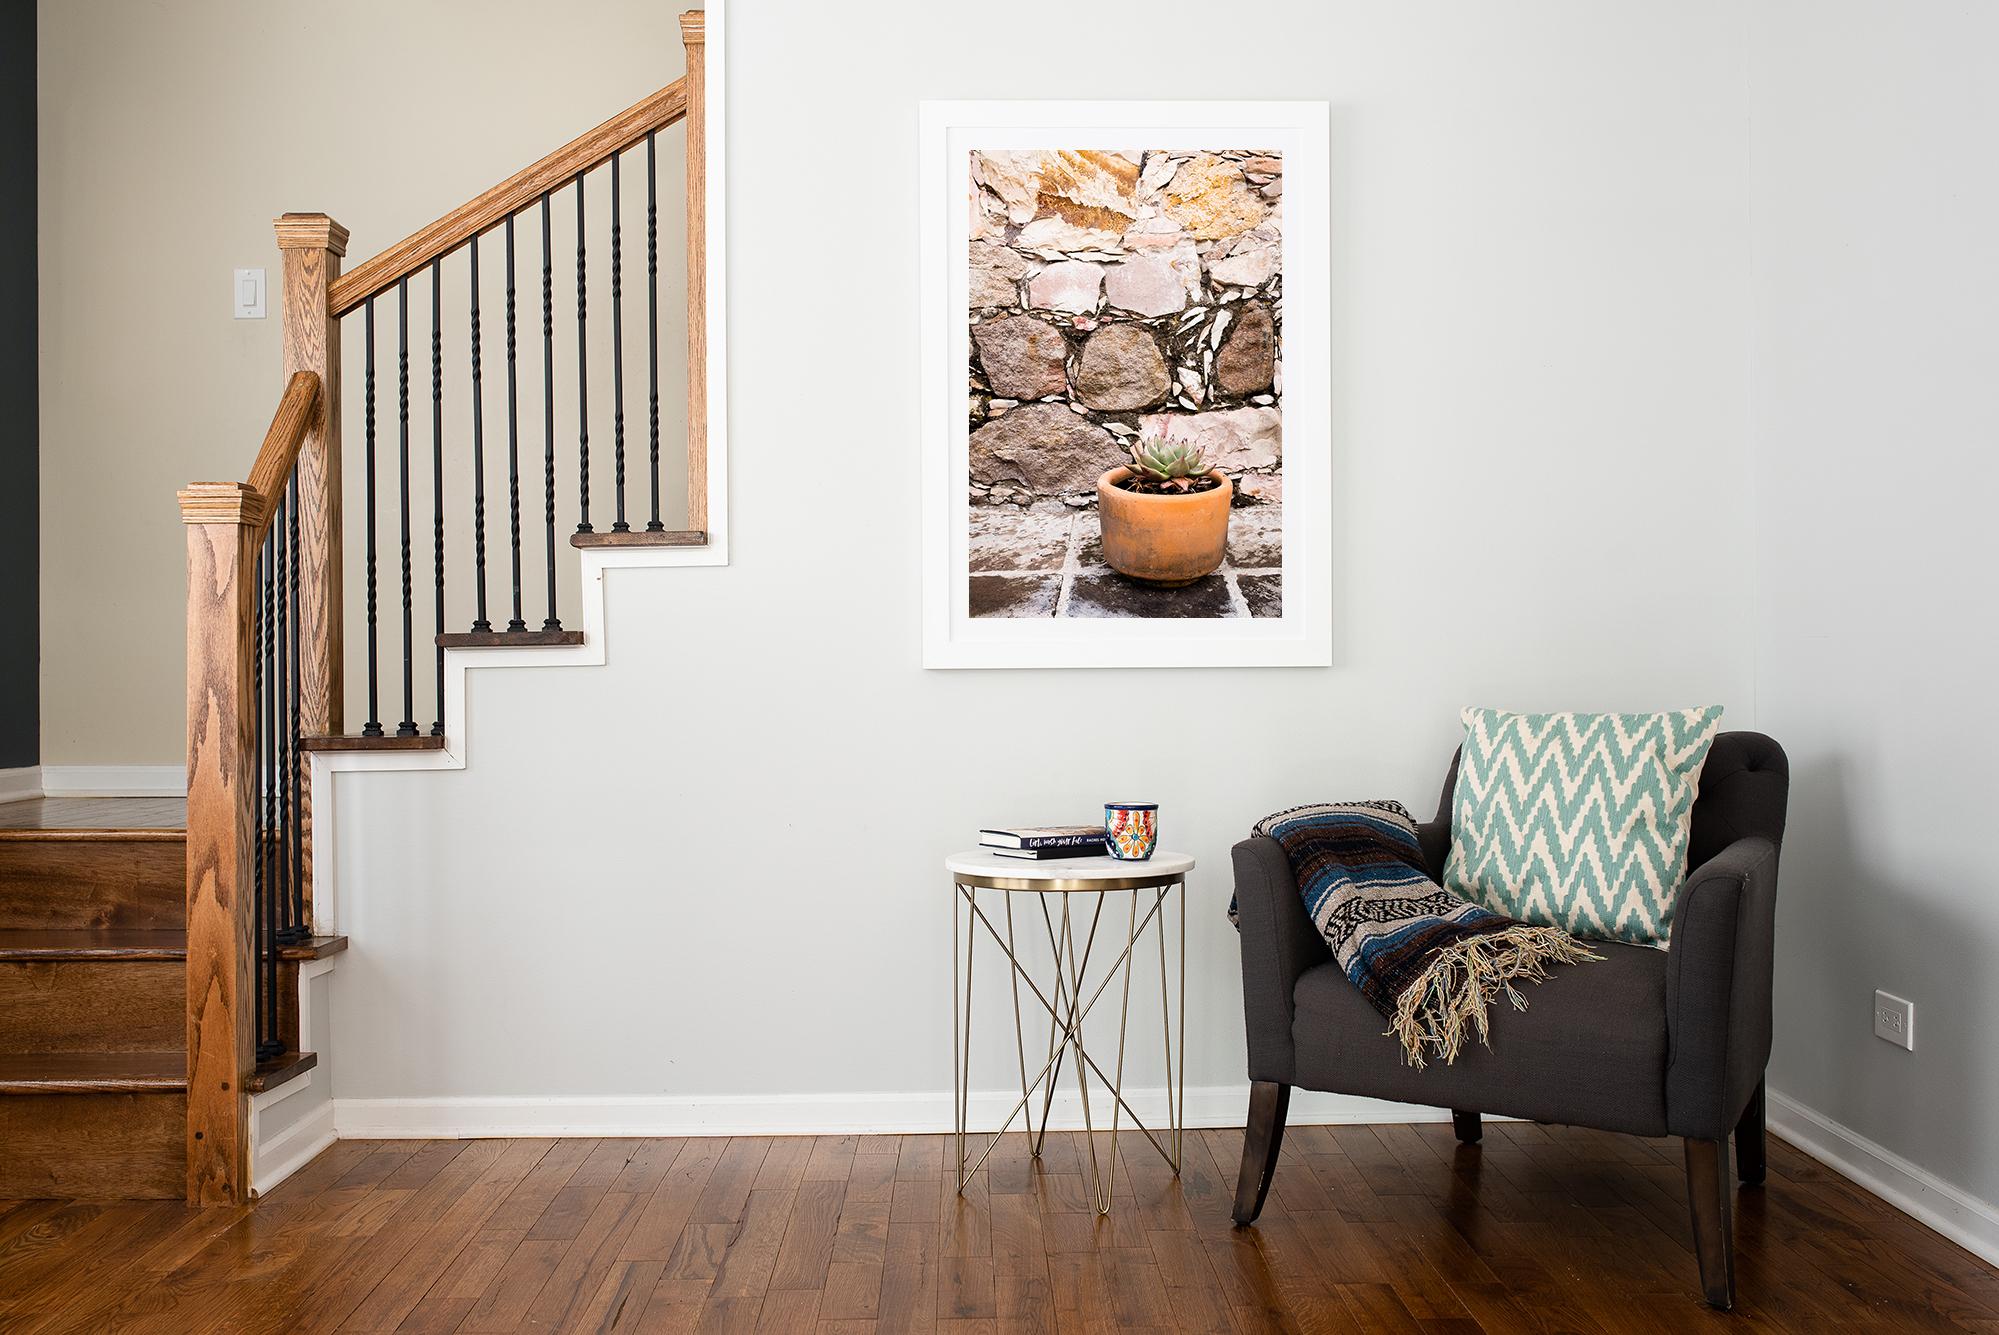 LaPlantaSuculenta-home-decor-mexican-framed-prints-mexico-sanmiguel-karinamoraprints-BW.jpg